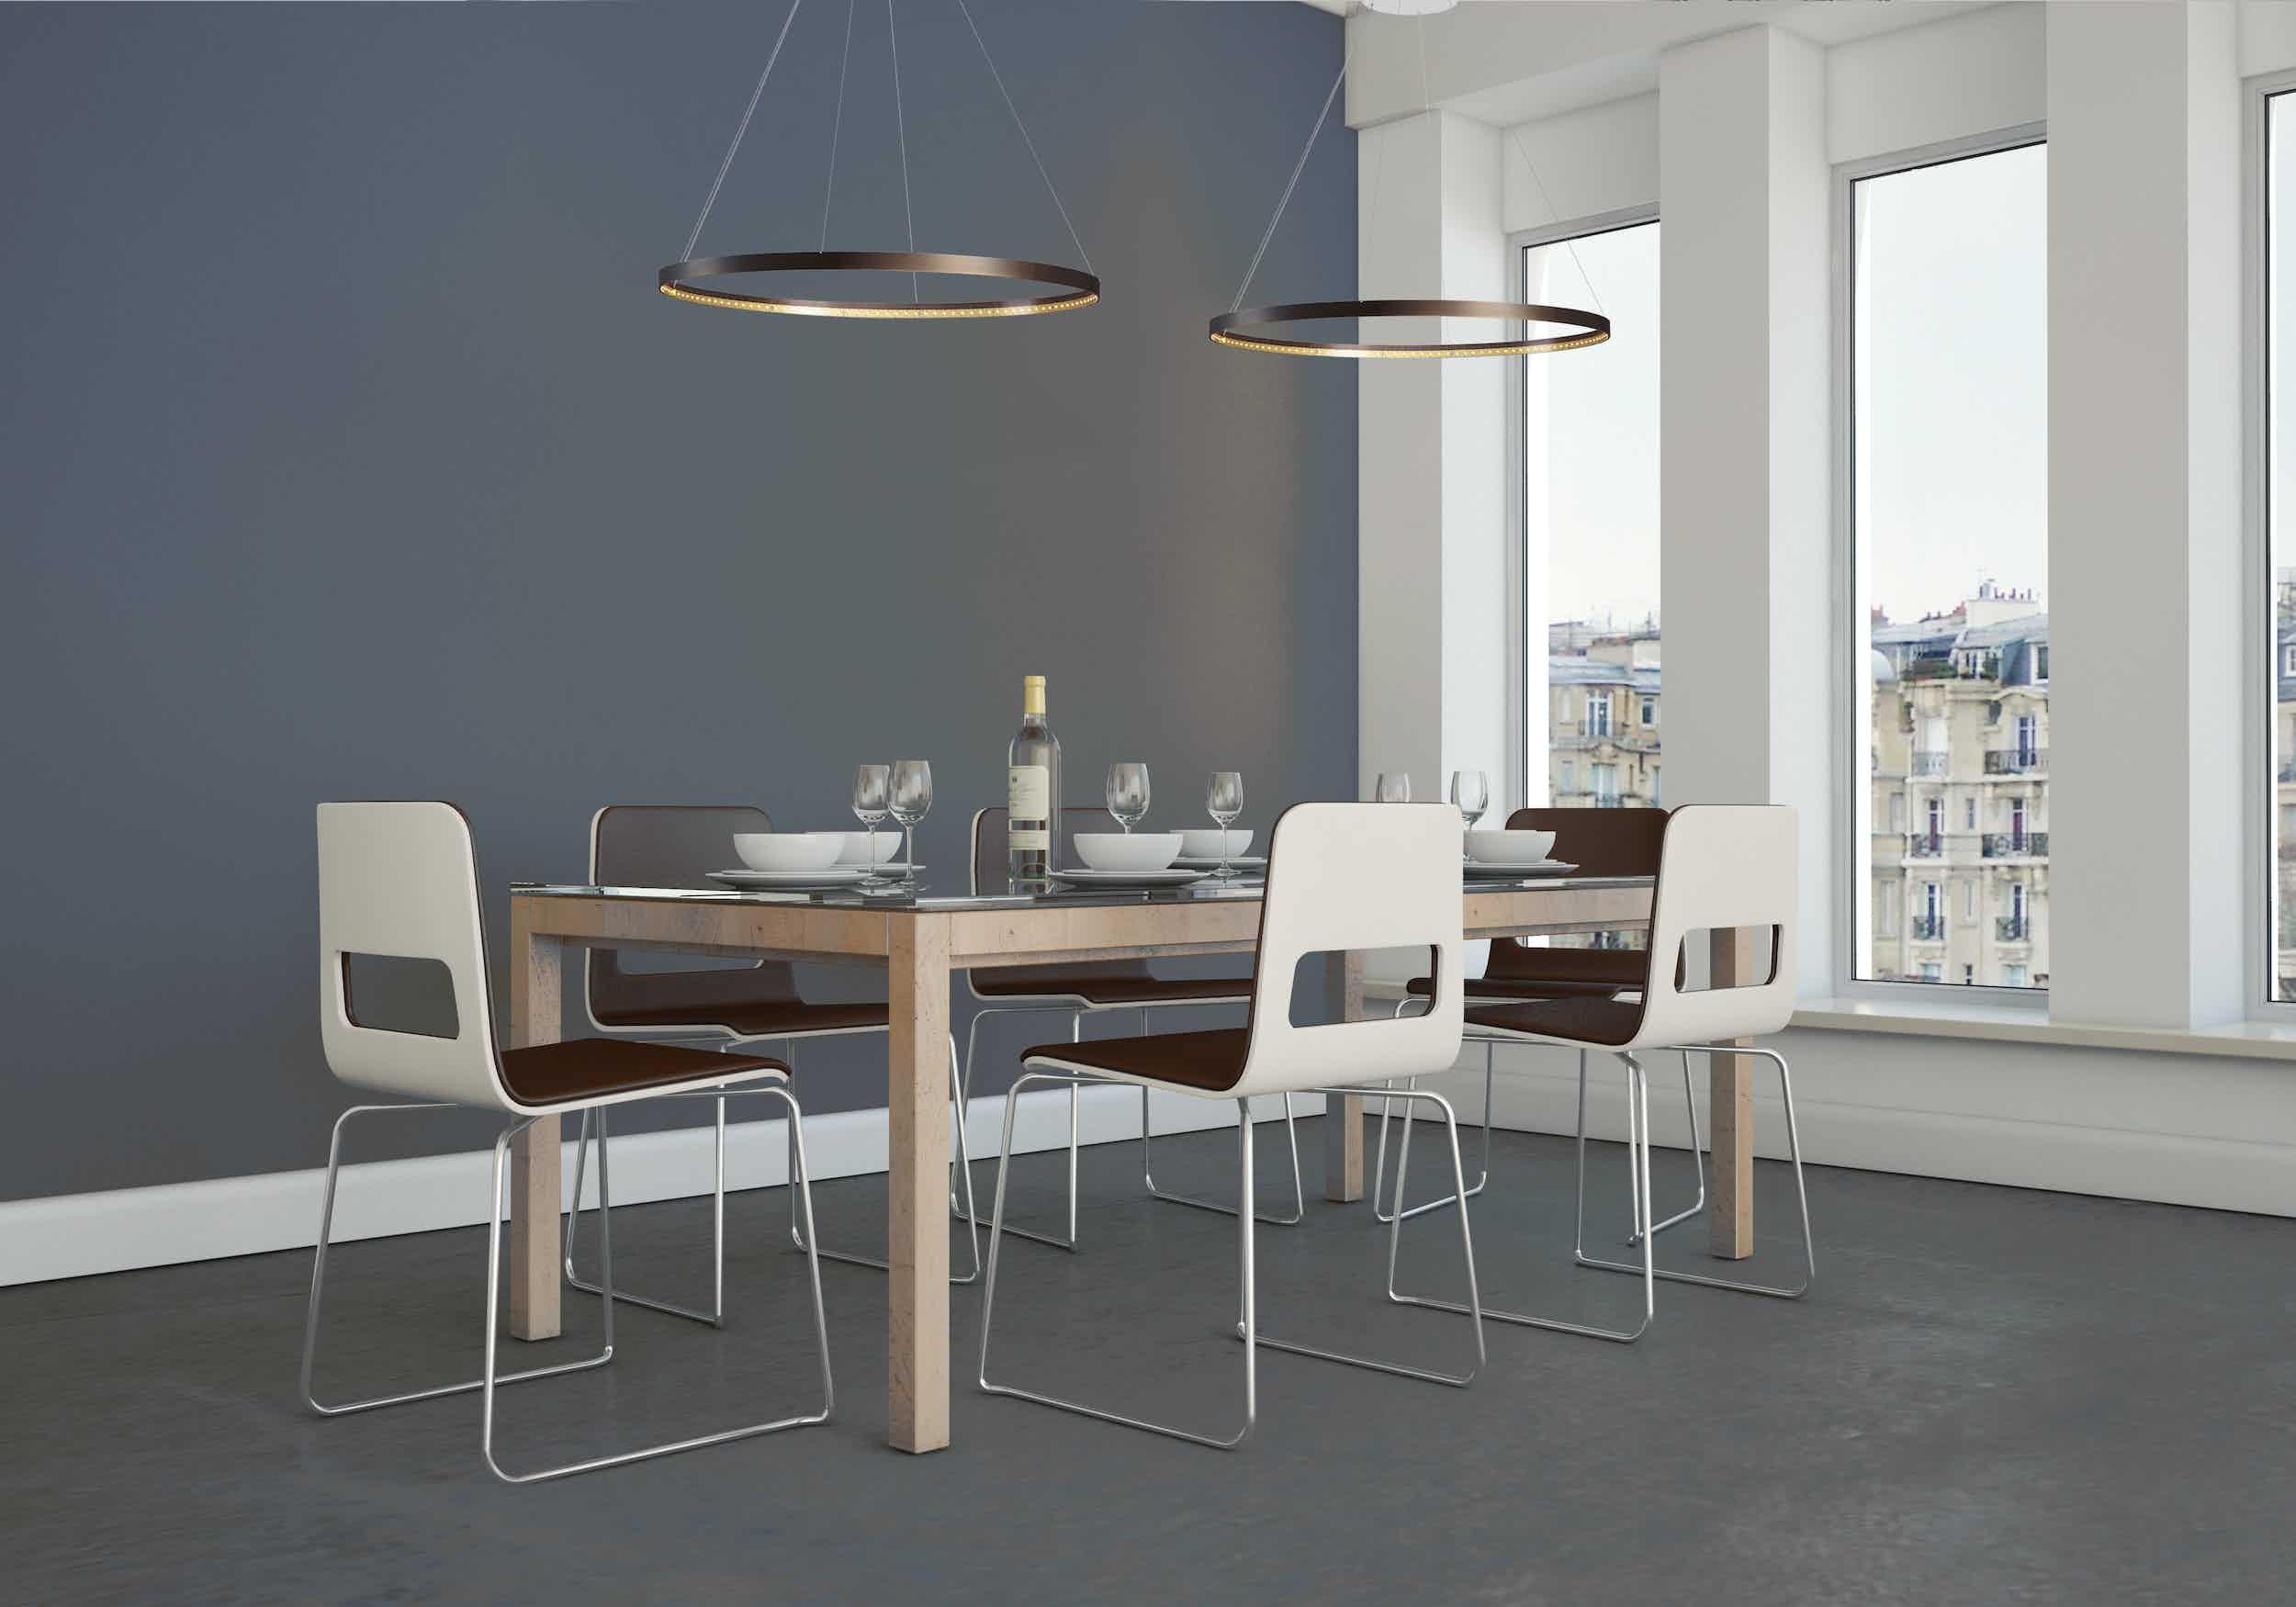 2le-deun-luminaires-circle-80-hanging-lamp-bronze-two-haute-living